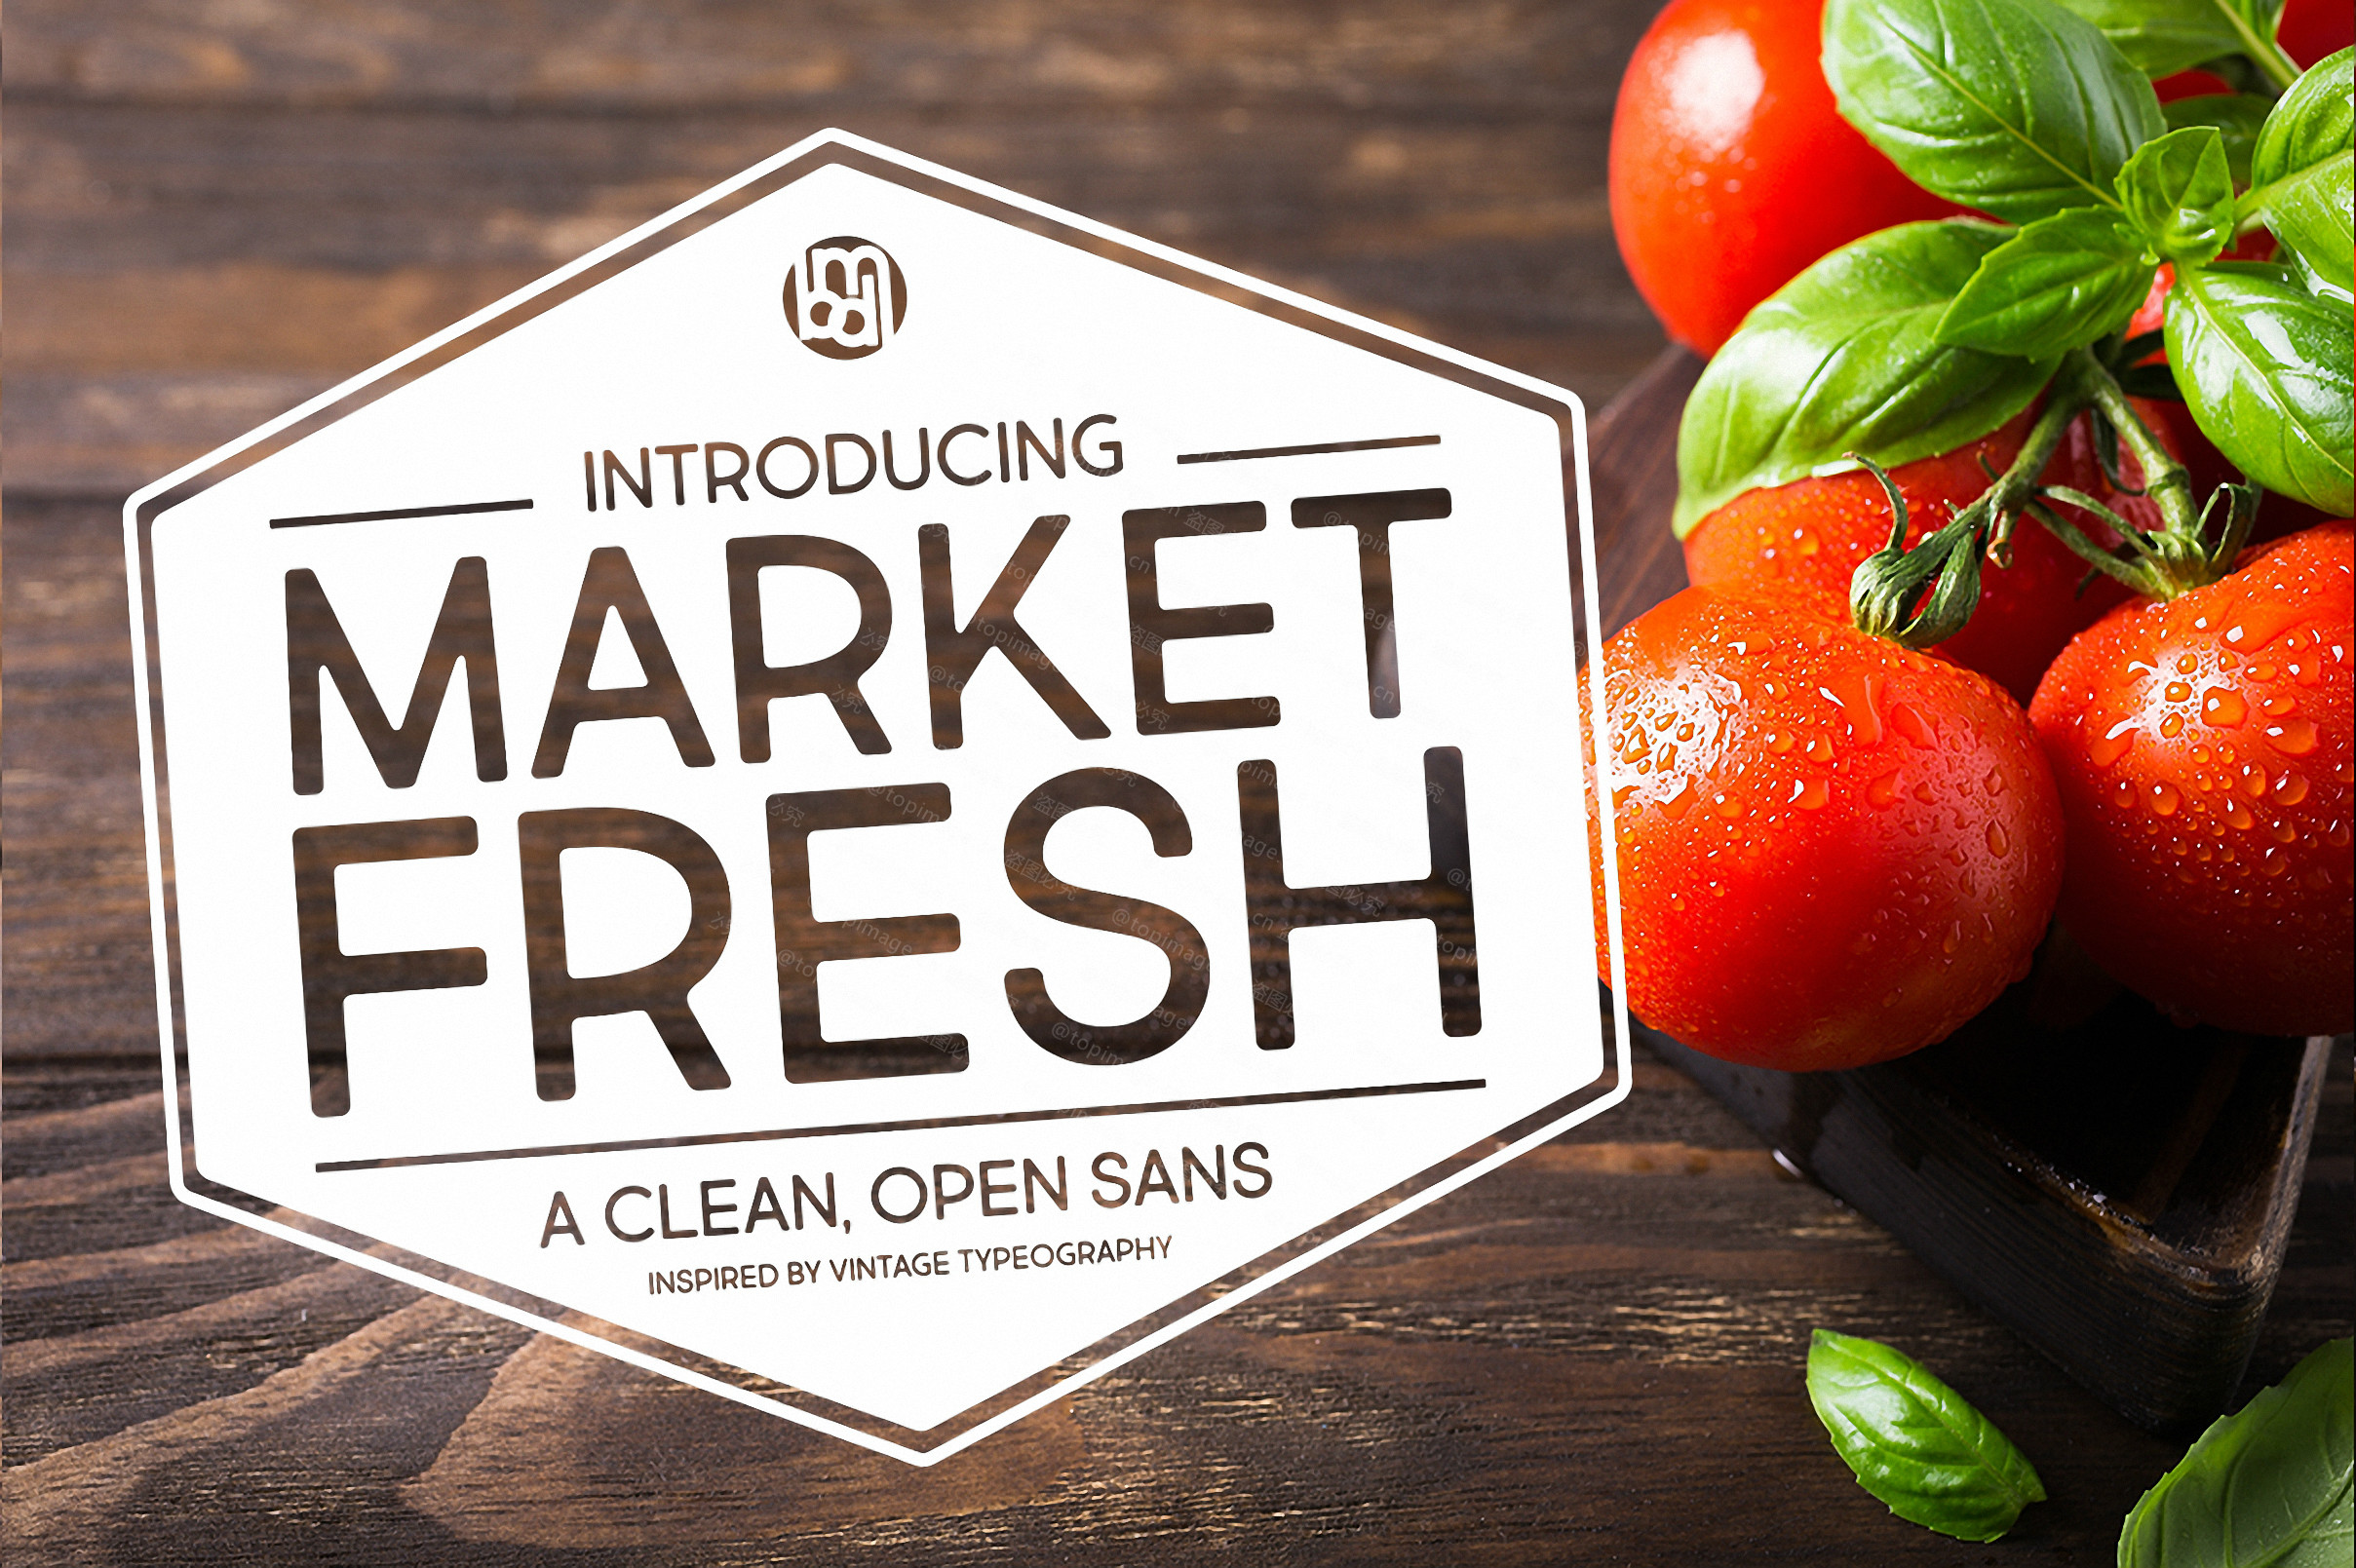 MarketFresh极简洁logo圆润英文字体下载